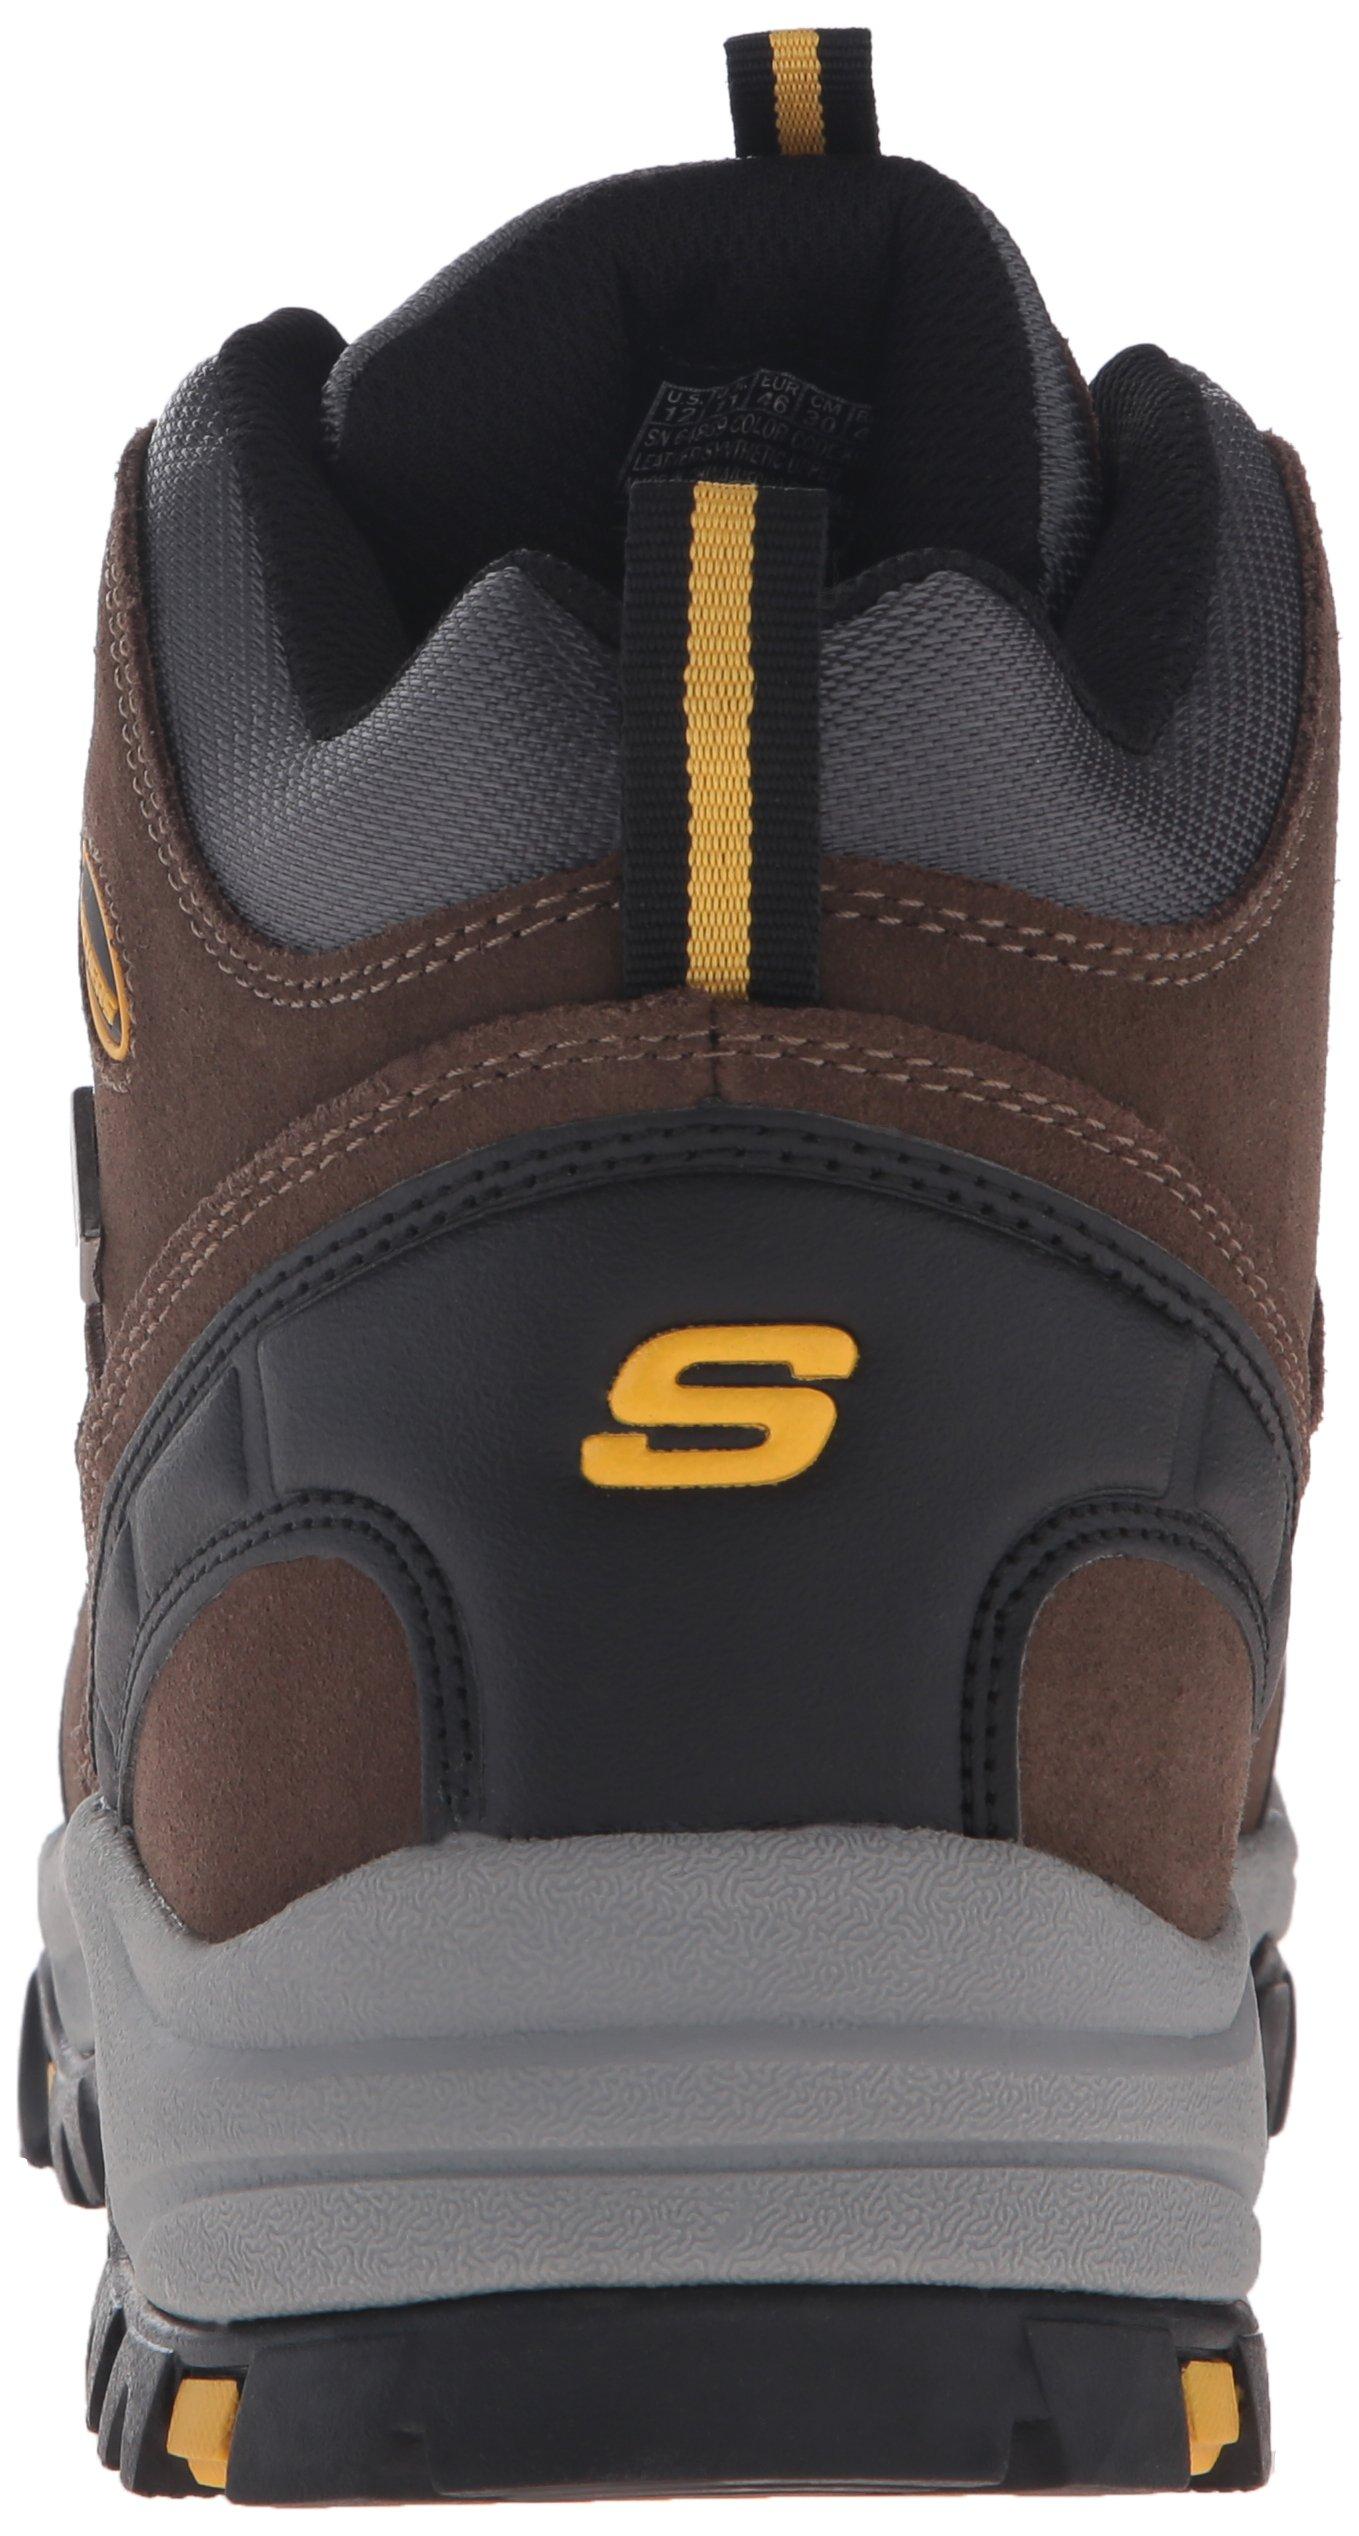 Skechers Men's Relment Pelmo High Rise Hiking Boots